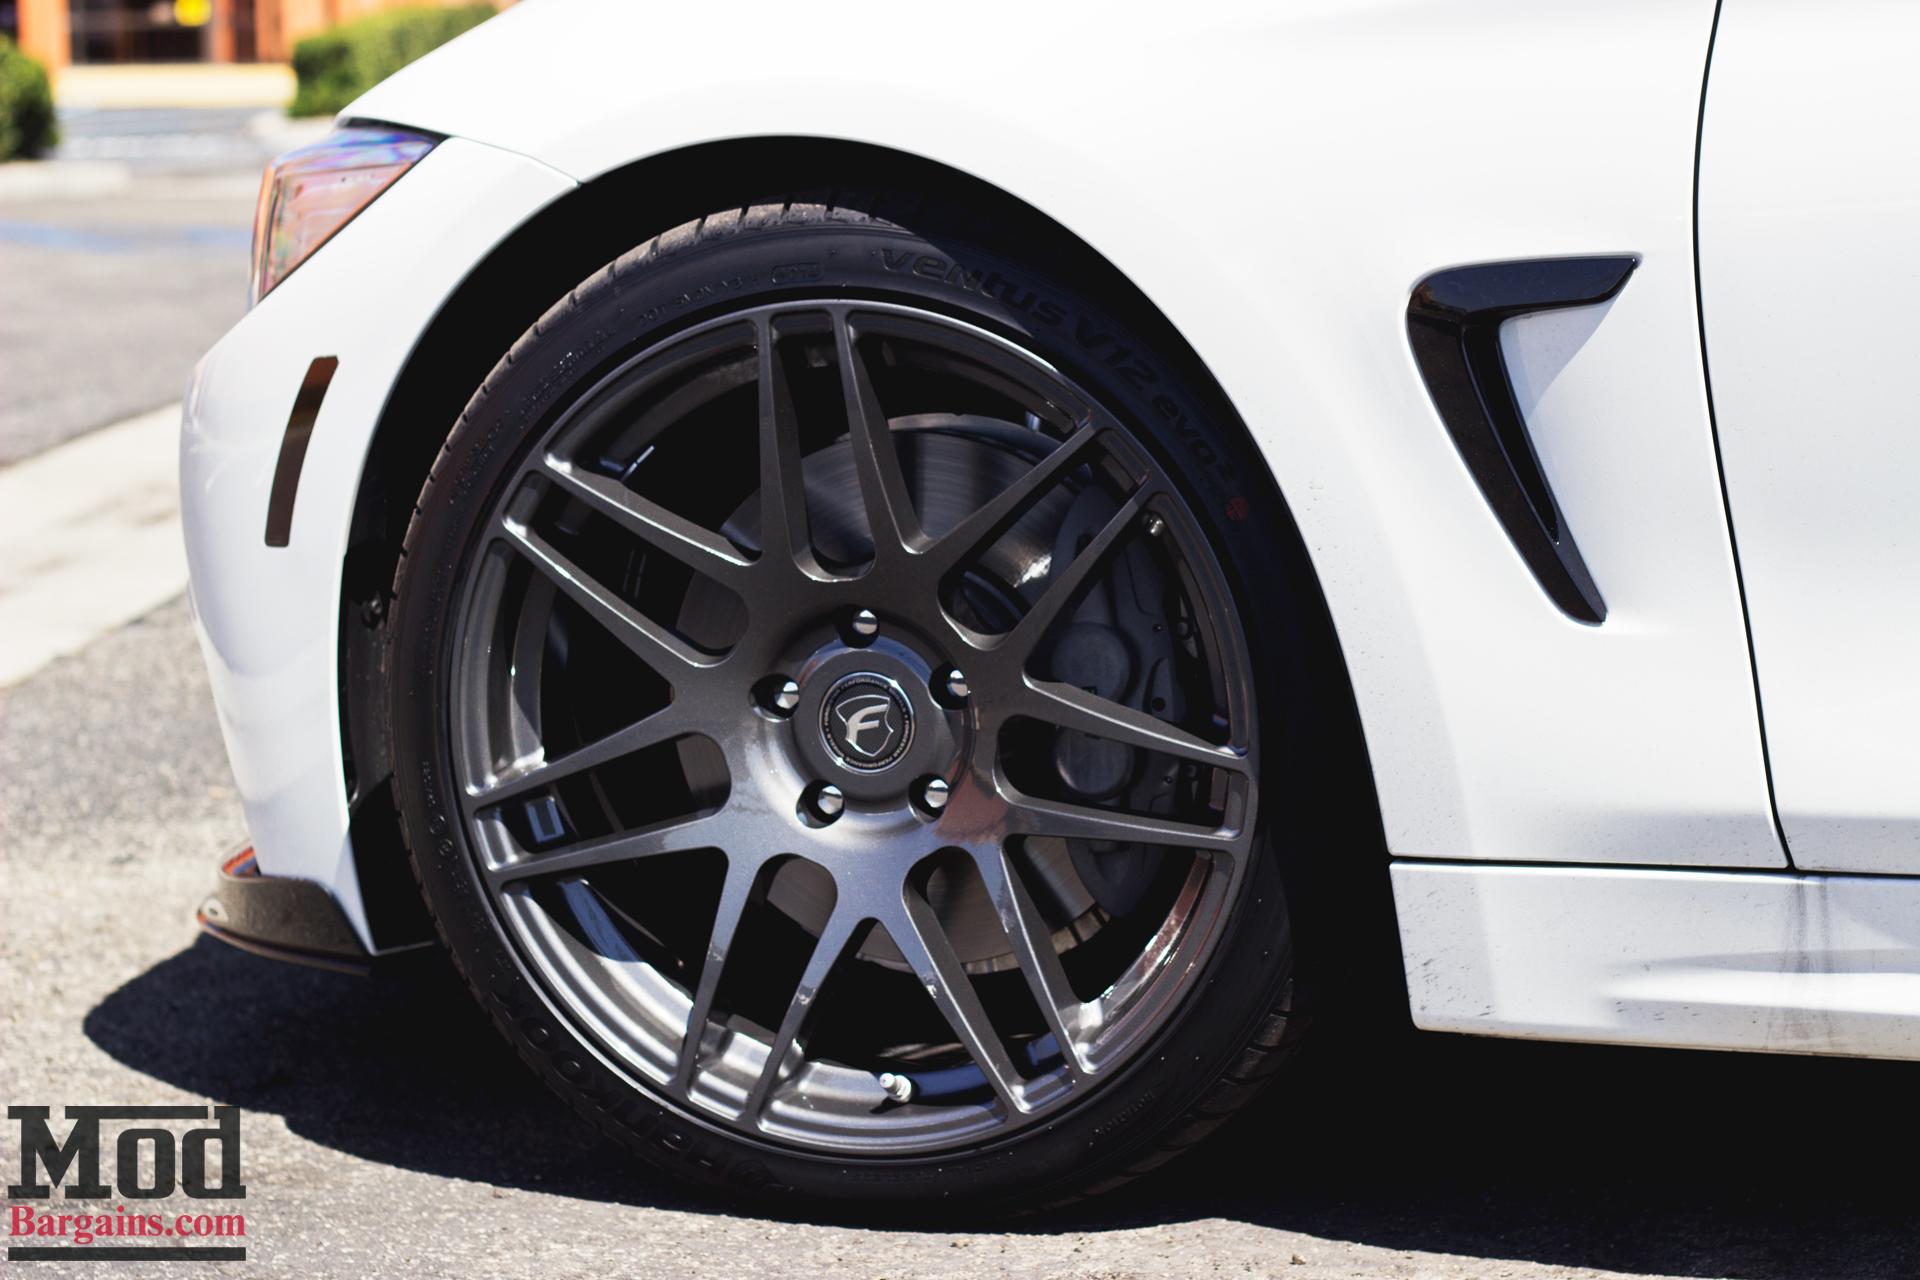 Forgestar F14 Wheels for BMW F32 435i 4-Series Installed 5